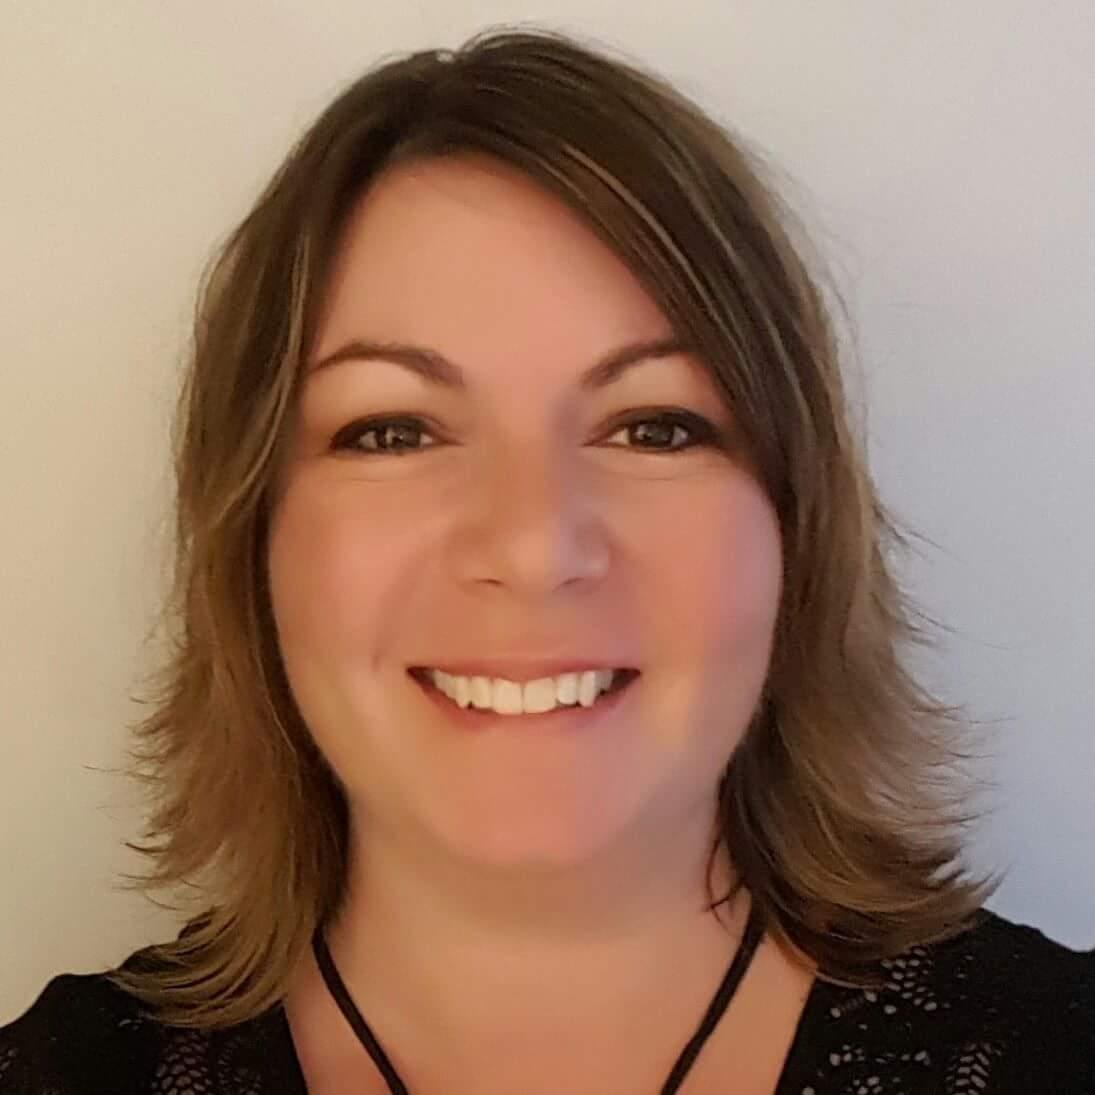 Tara Rendon Joins NorthAmericaTalk in Regional Sales Position